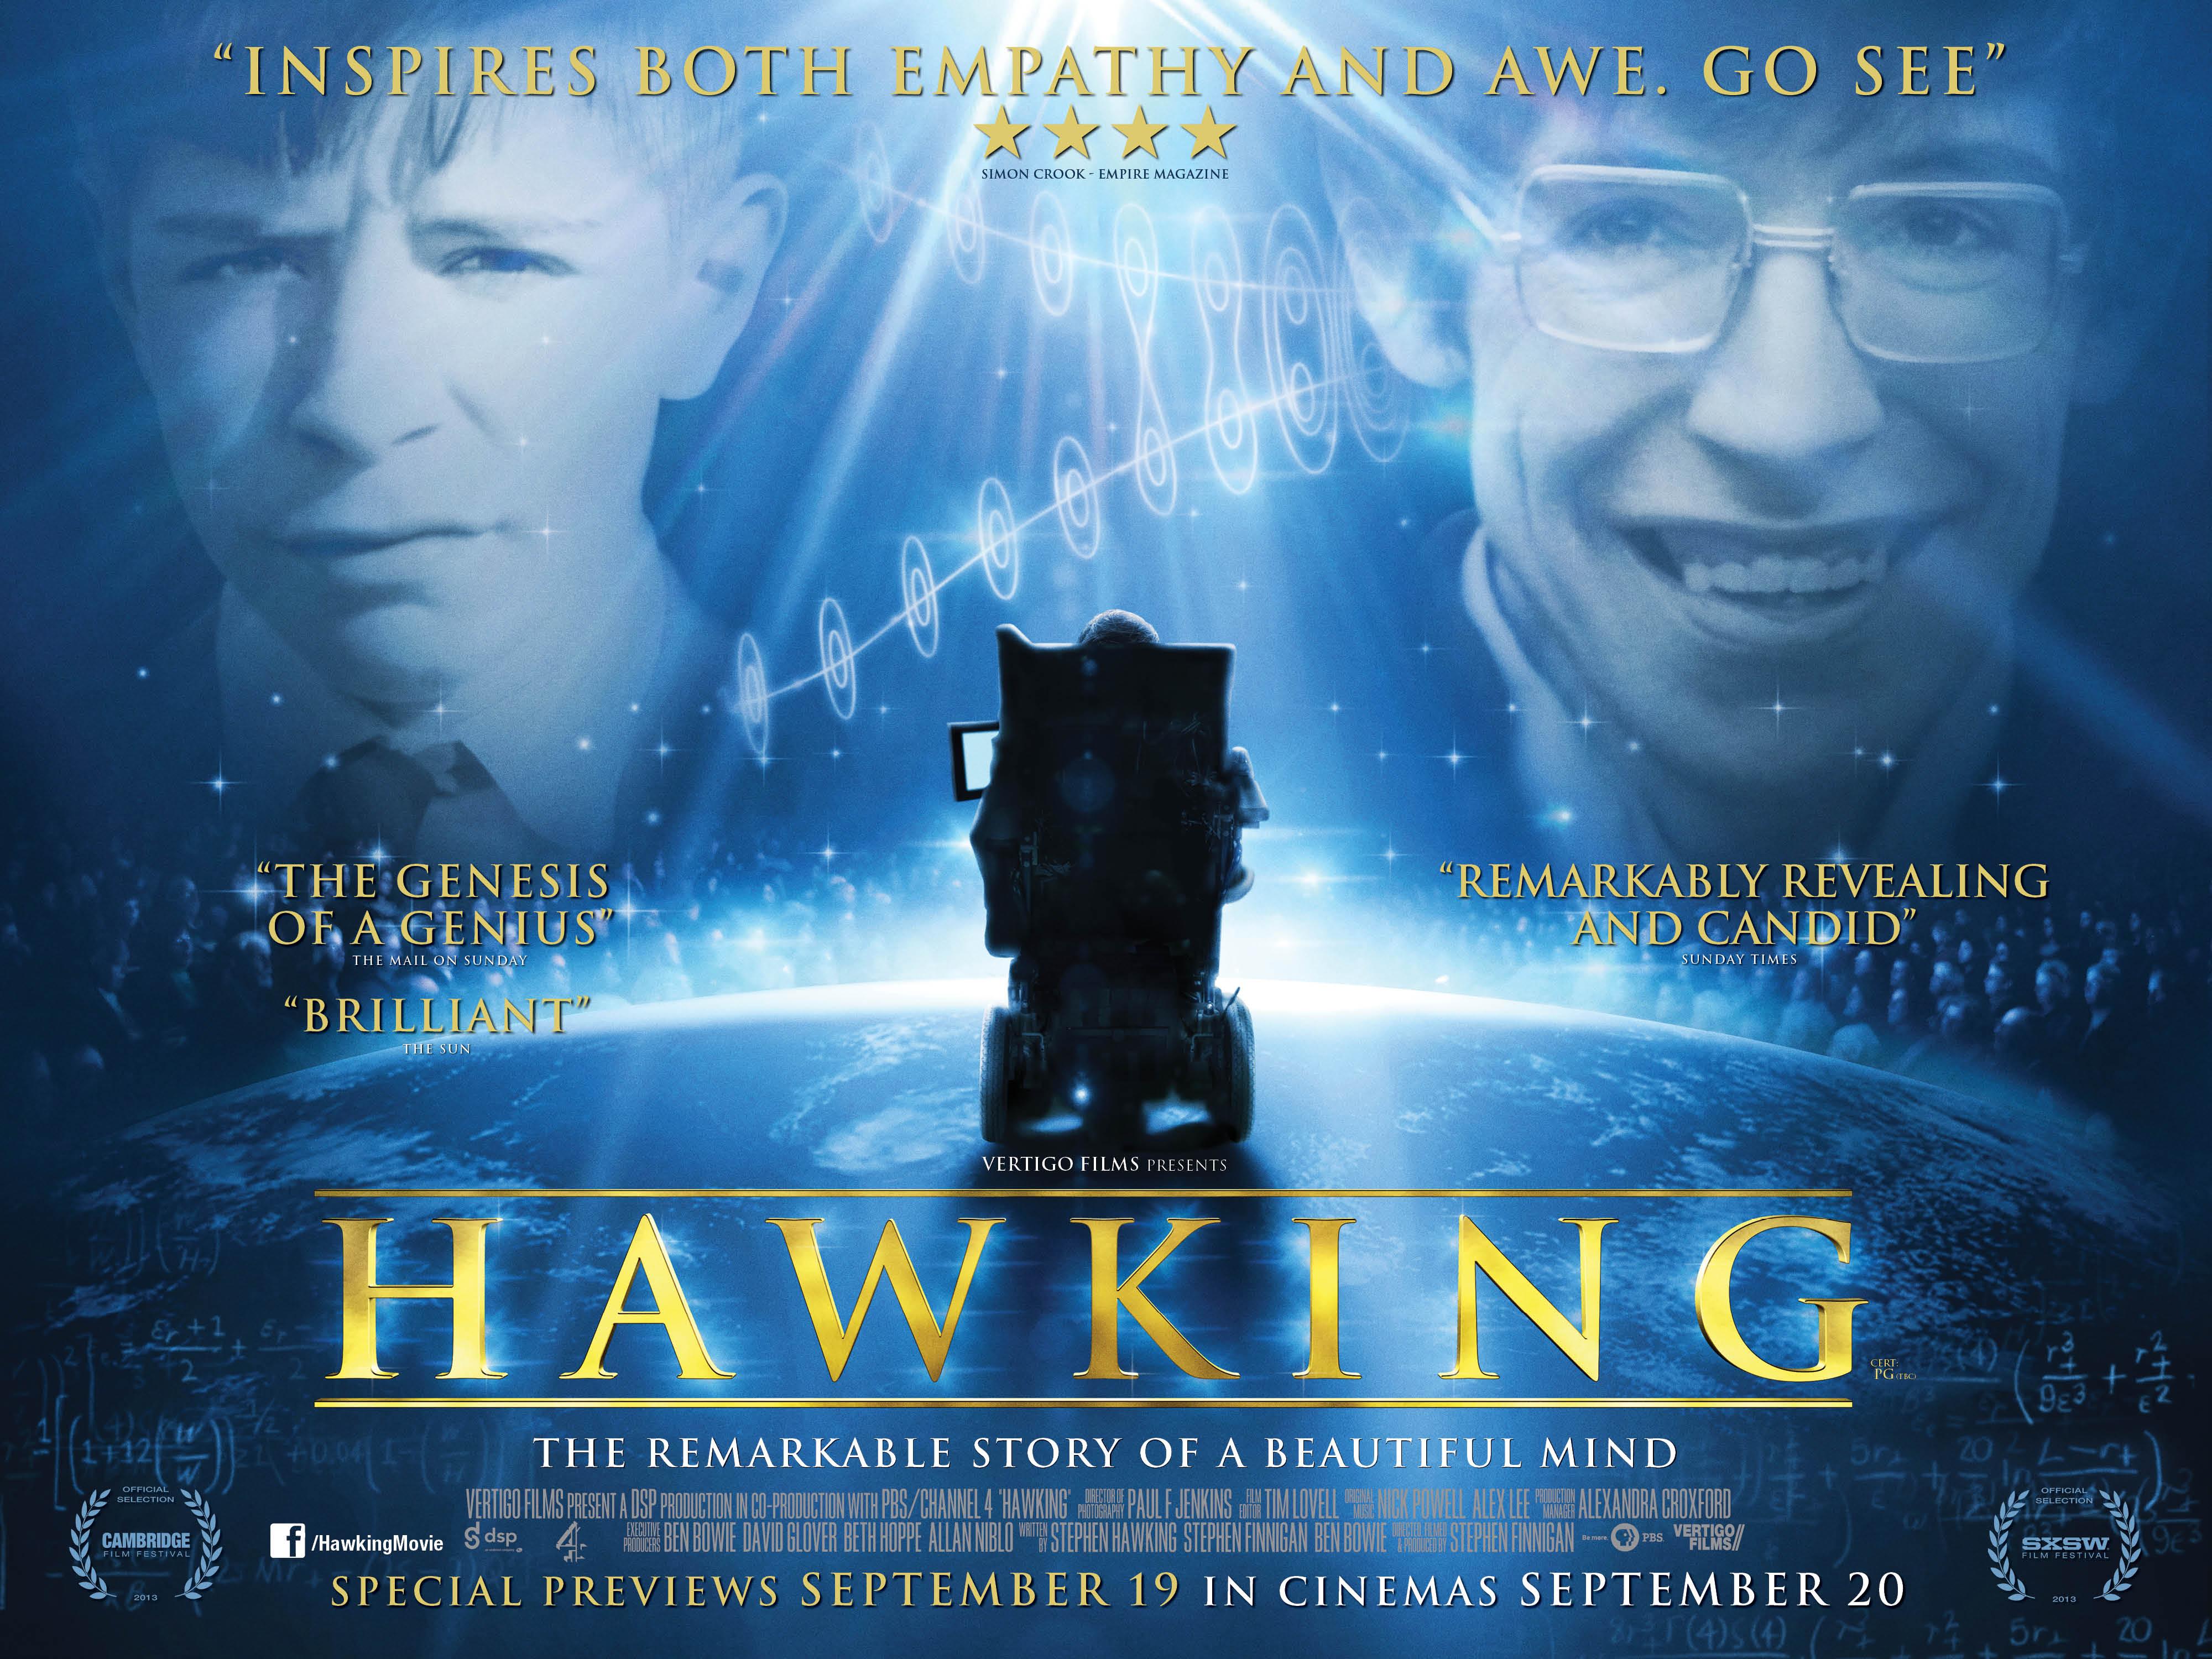 steven hawkings film